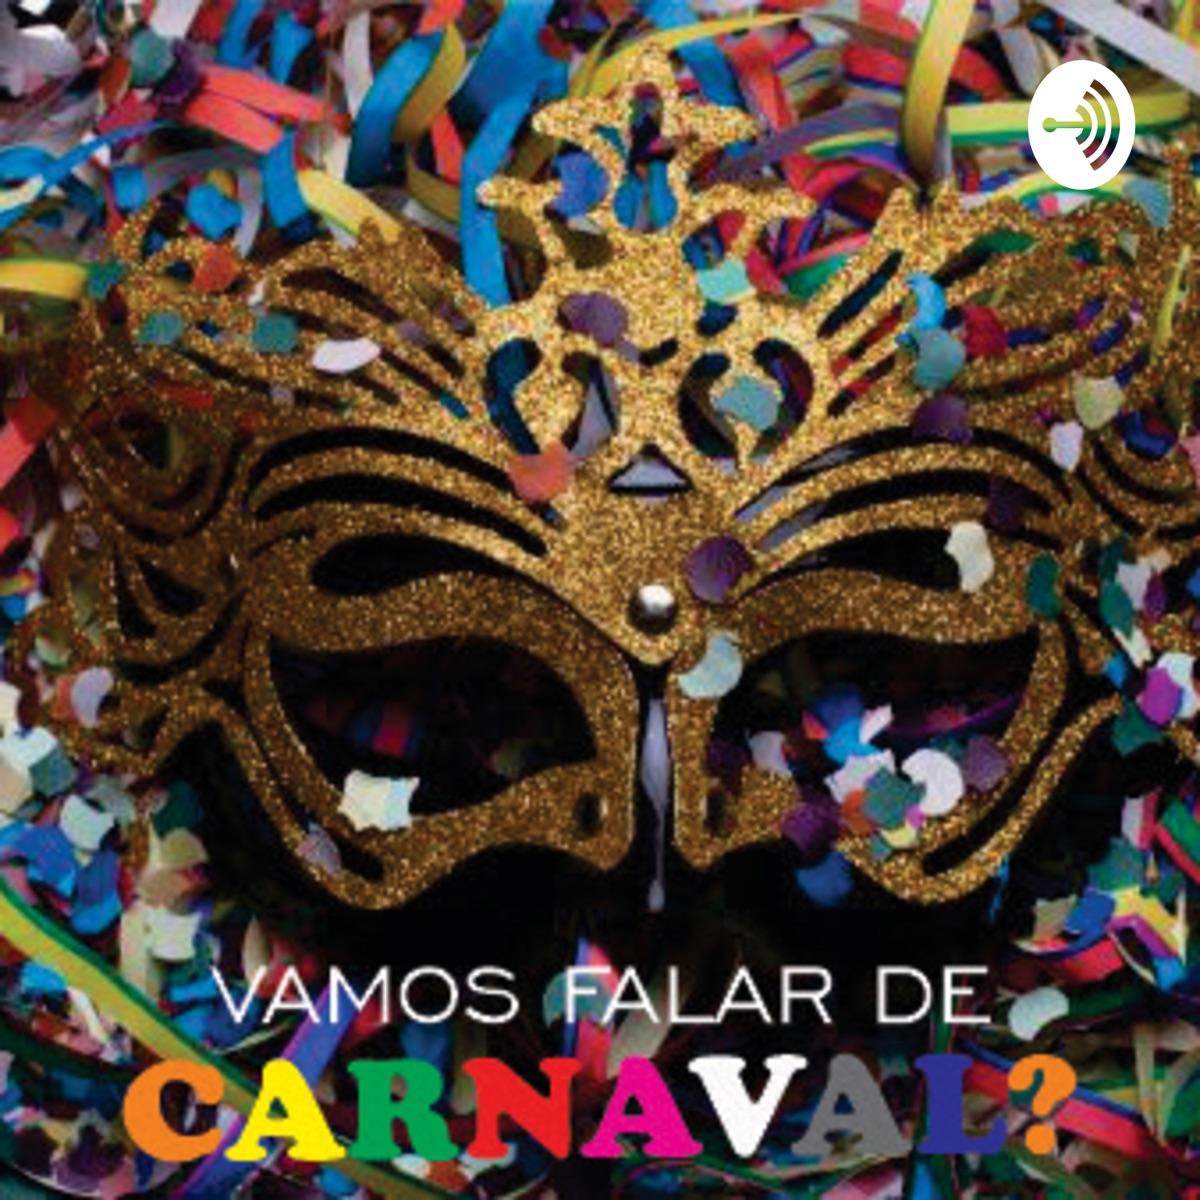 Vamos Falar de Carnaval?